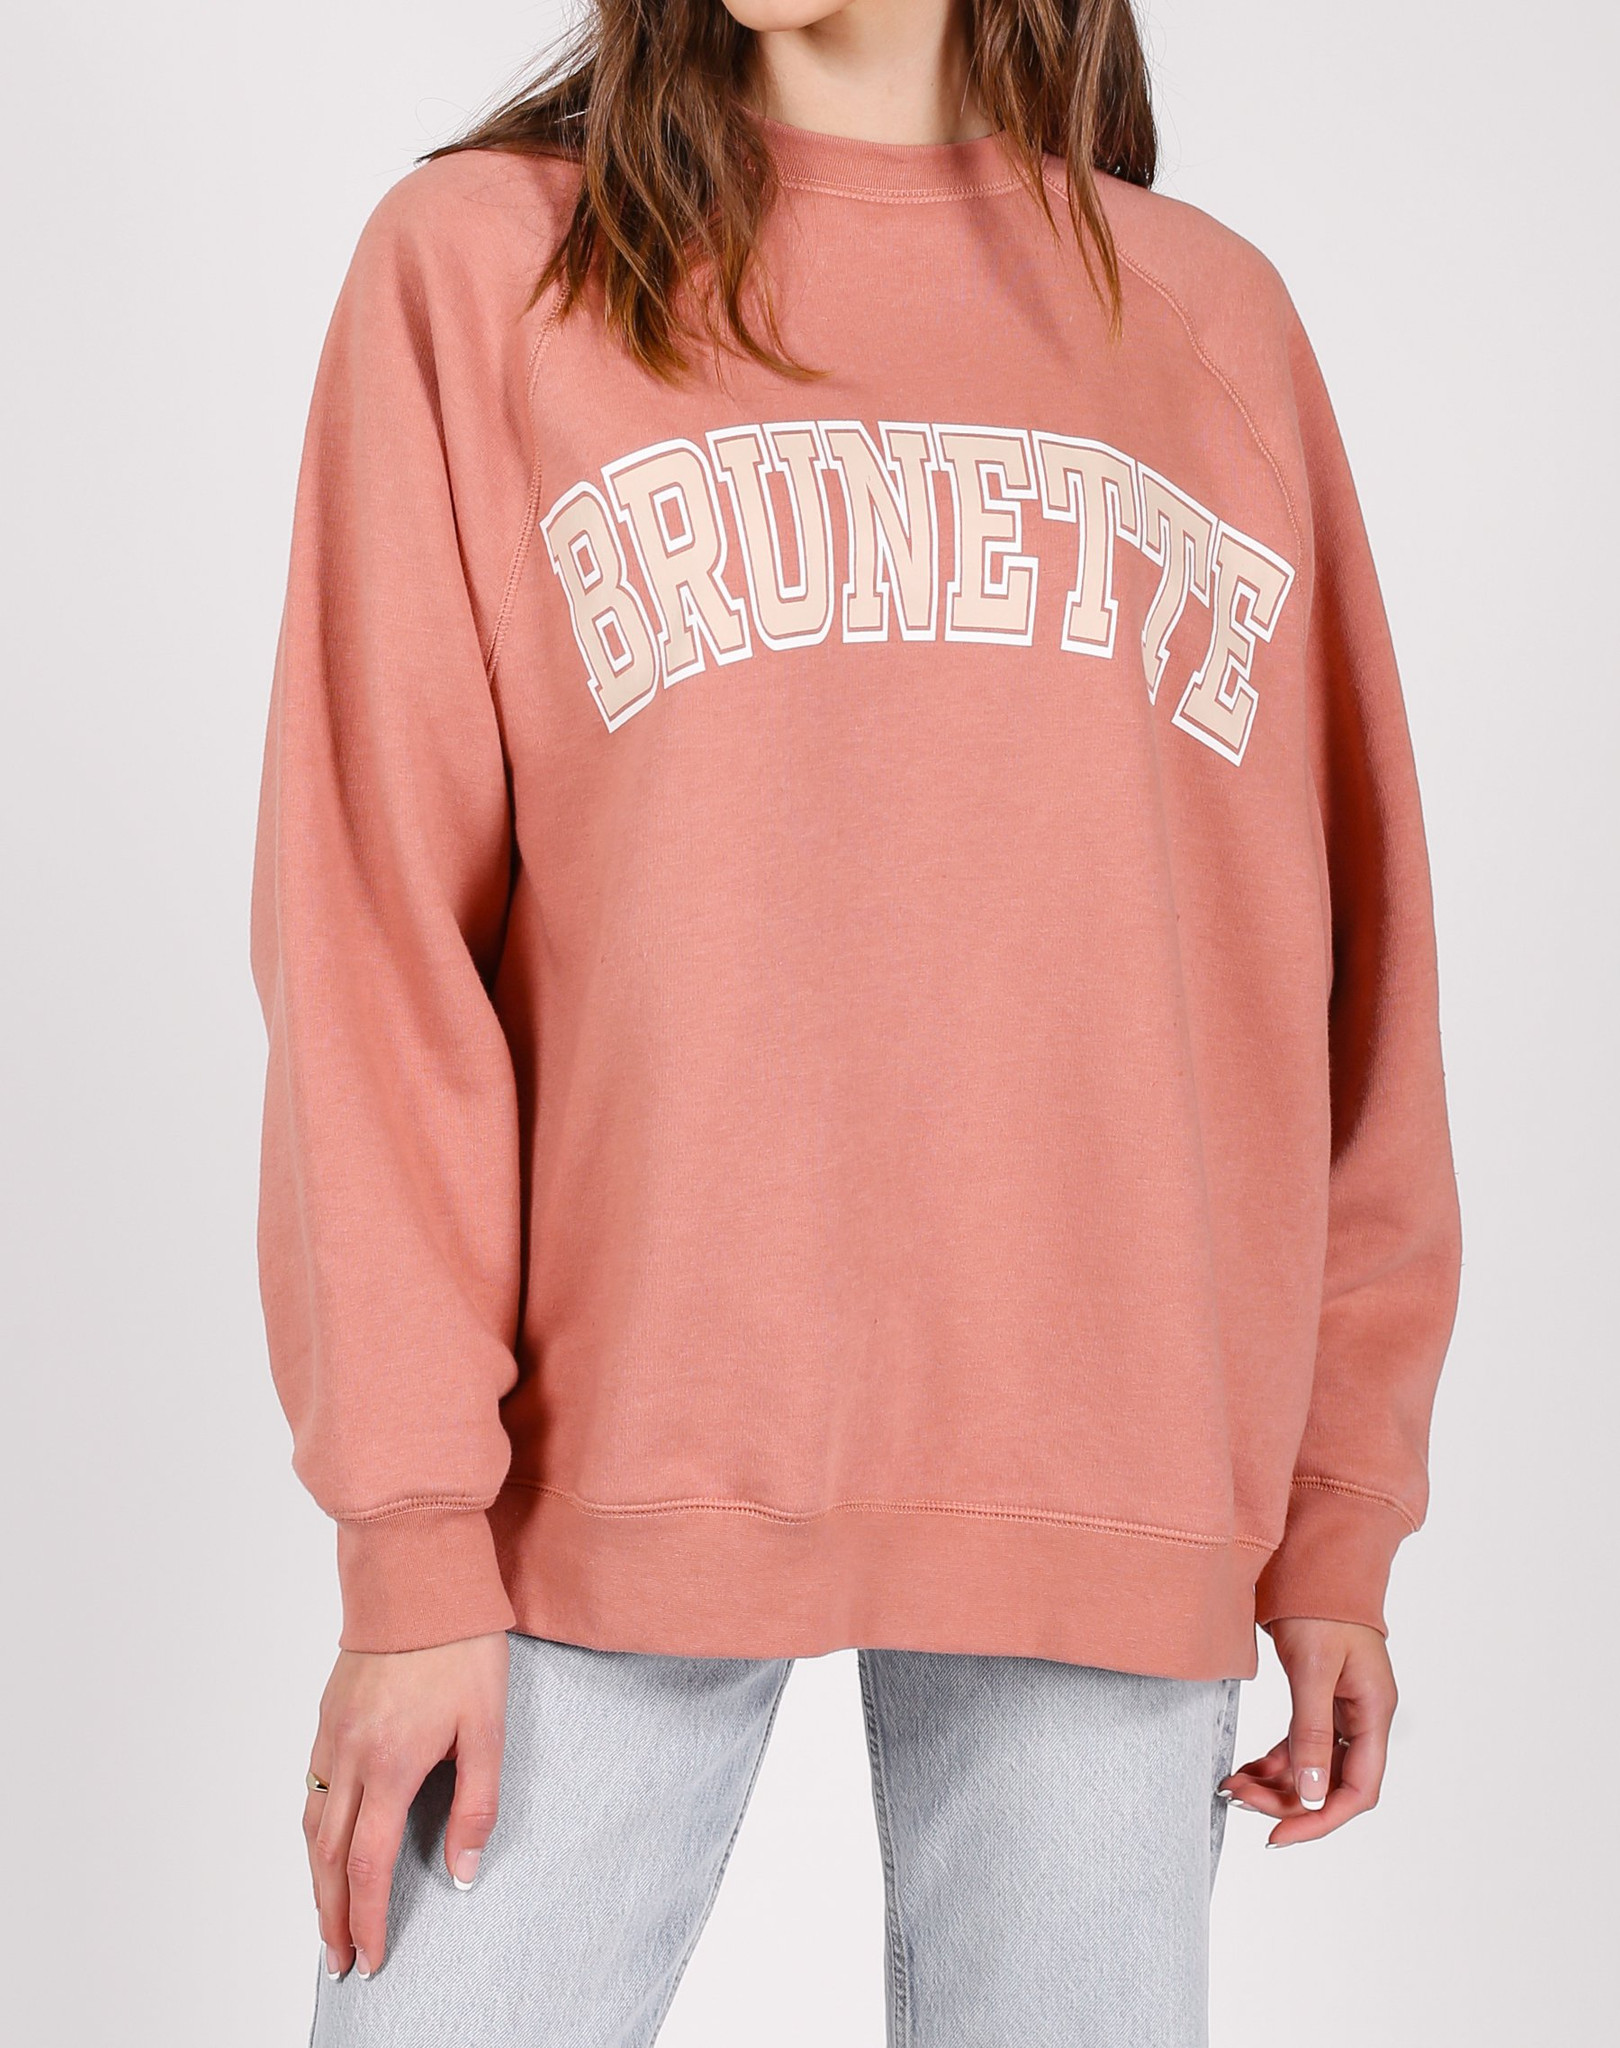 Brunette Not Your Boyfriends Crew in Rose